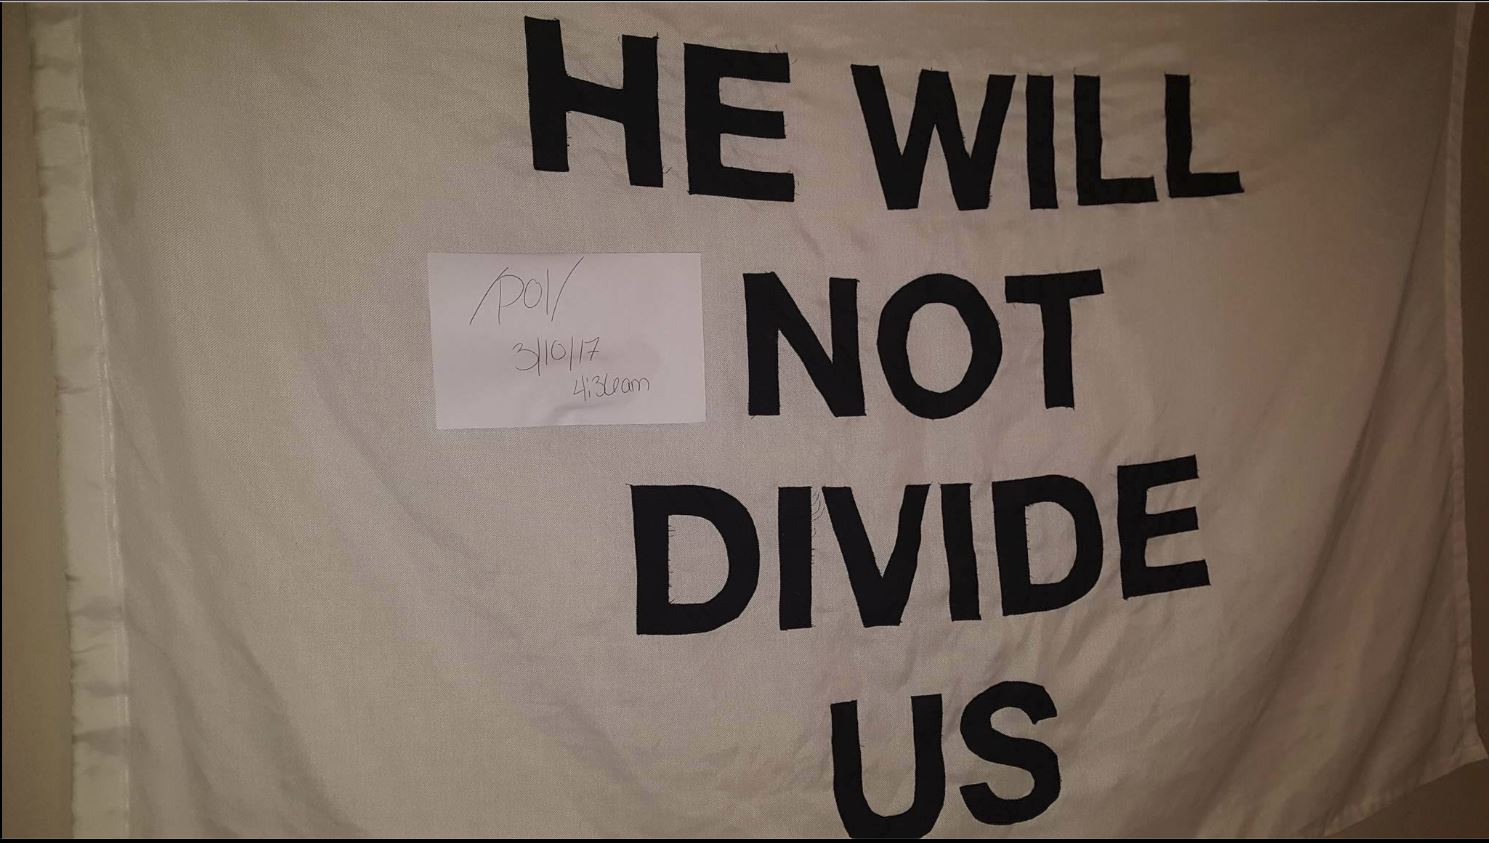 HWNDU_captured_flag he will not divide us